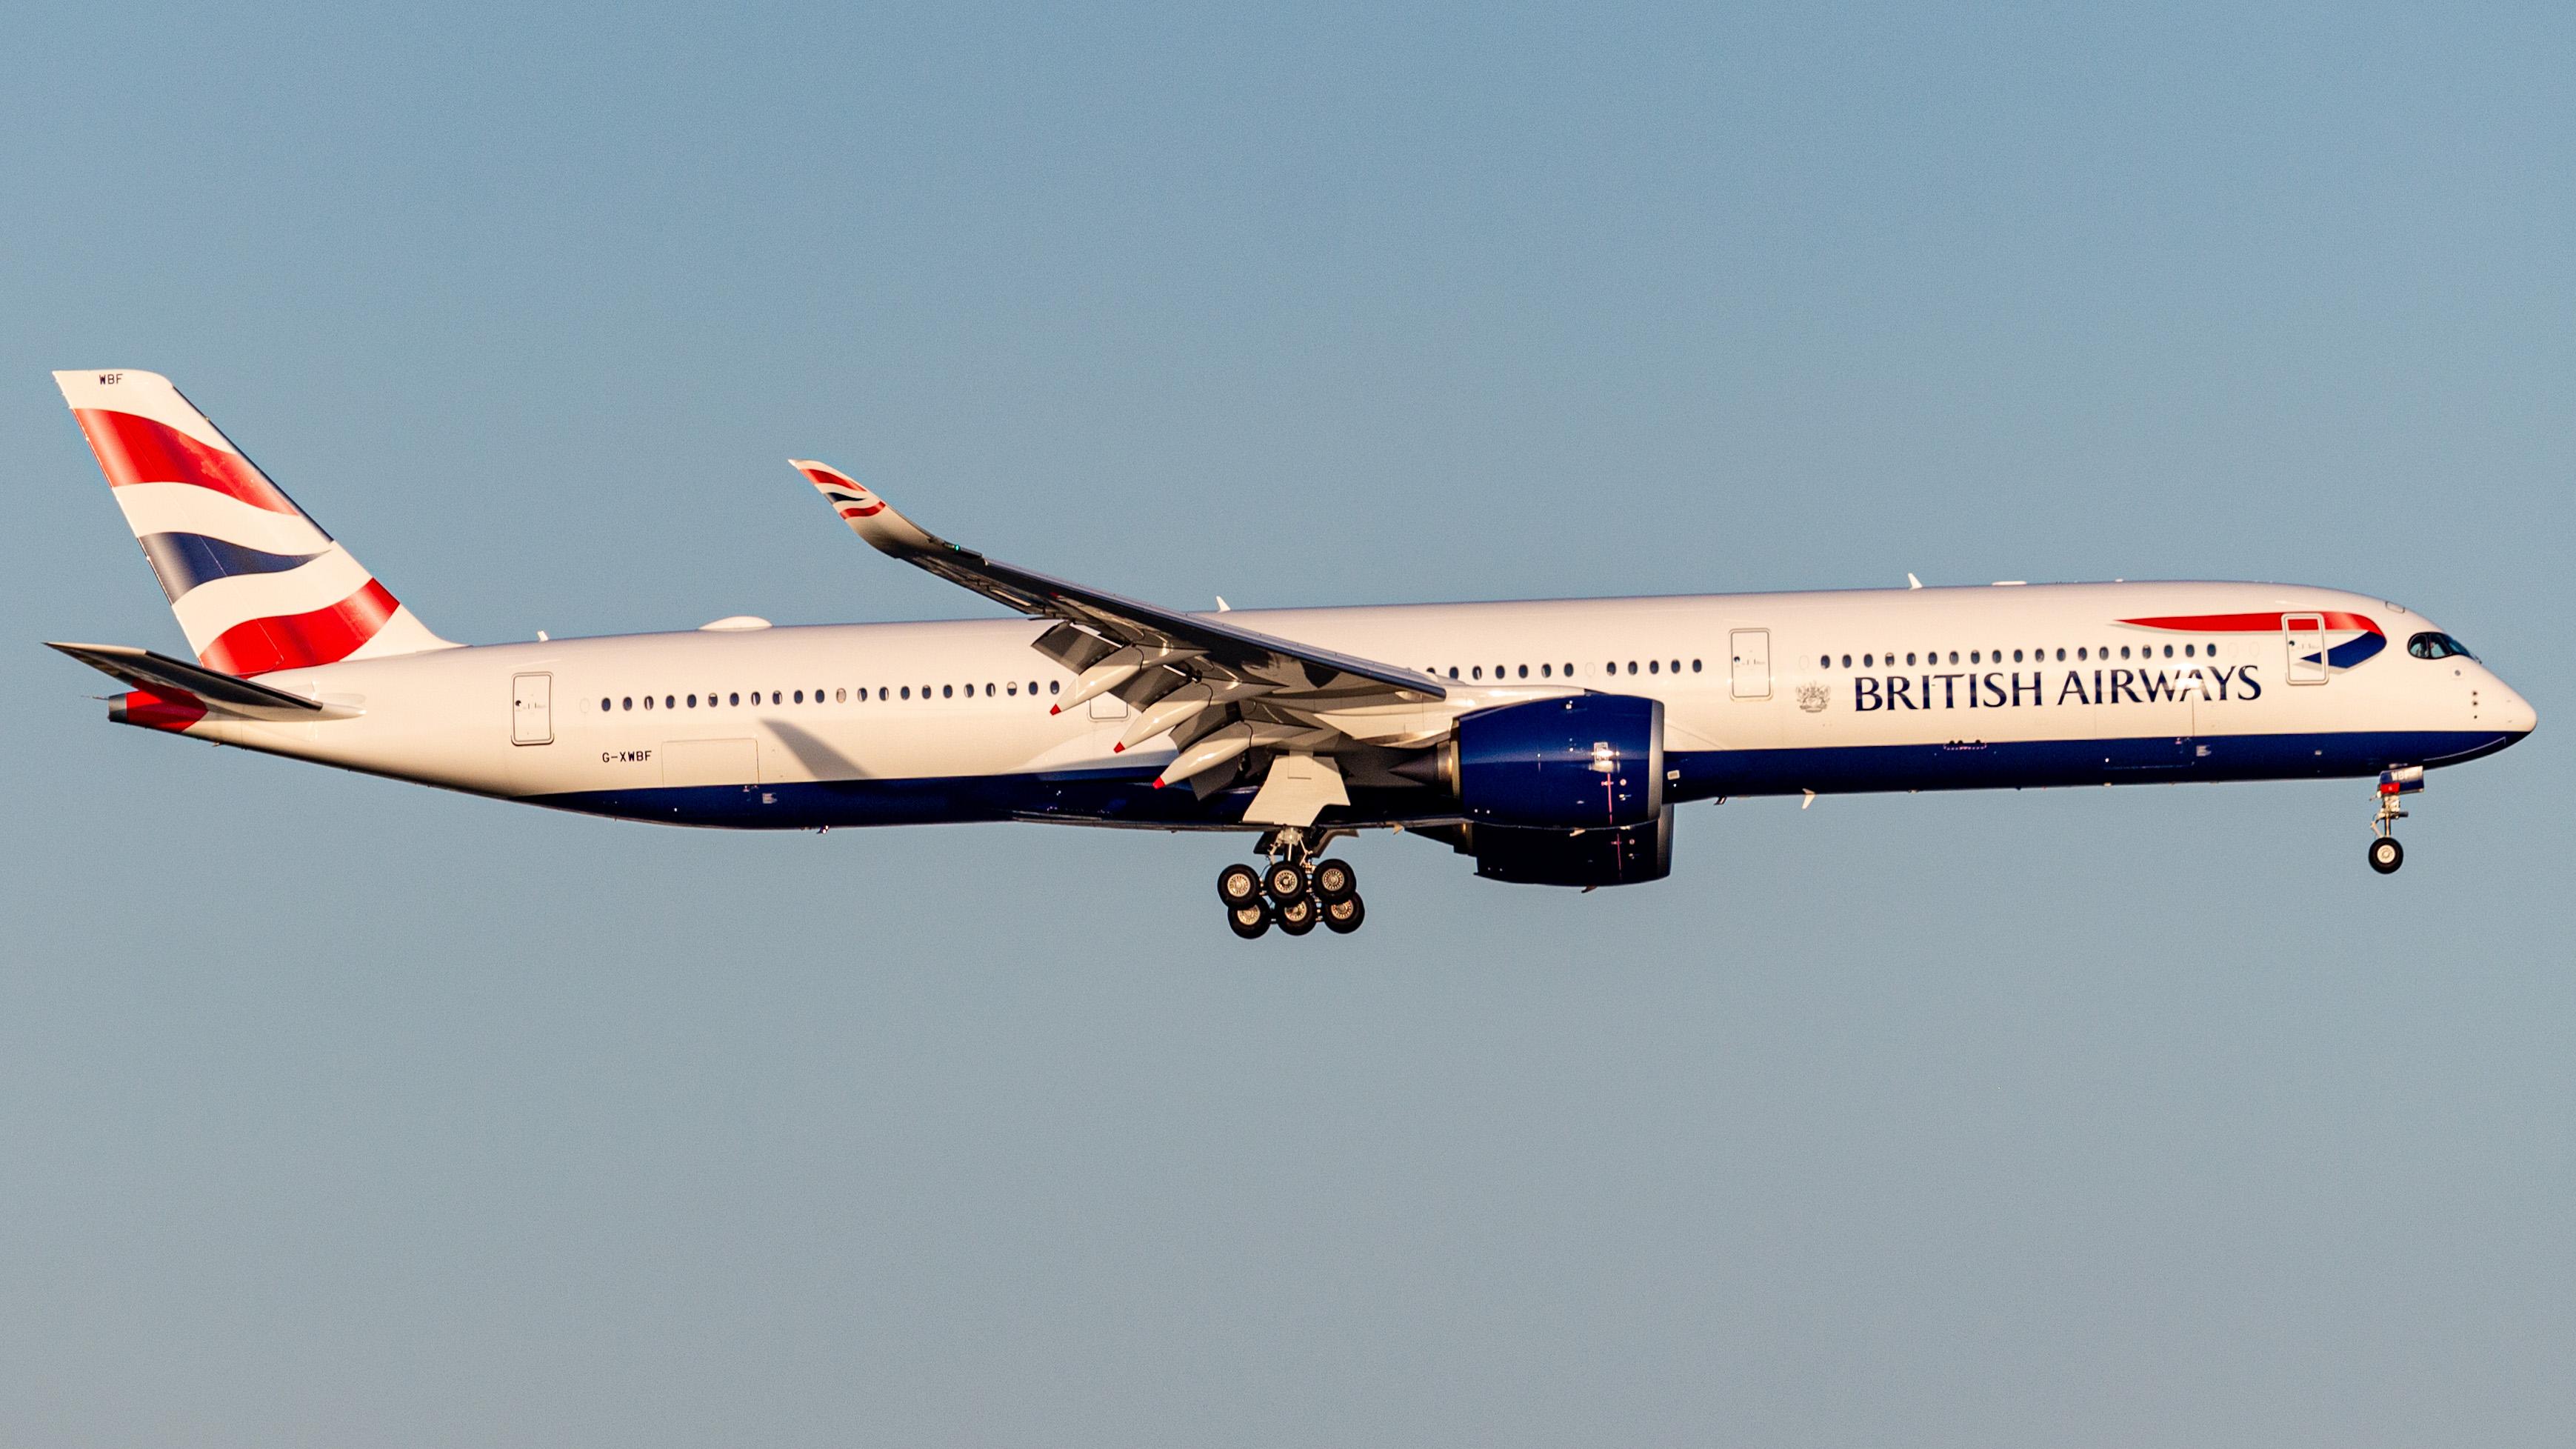 Photo of G-XWBF - British Airways Airbus A350-1000 at BOS